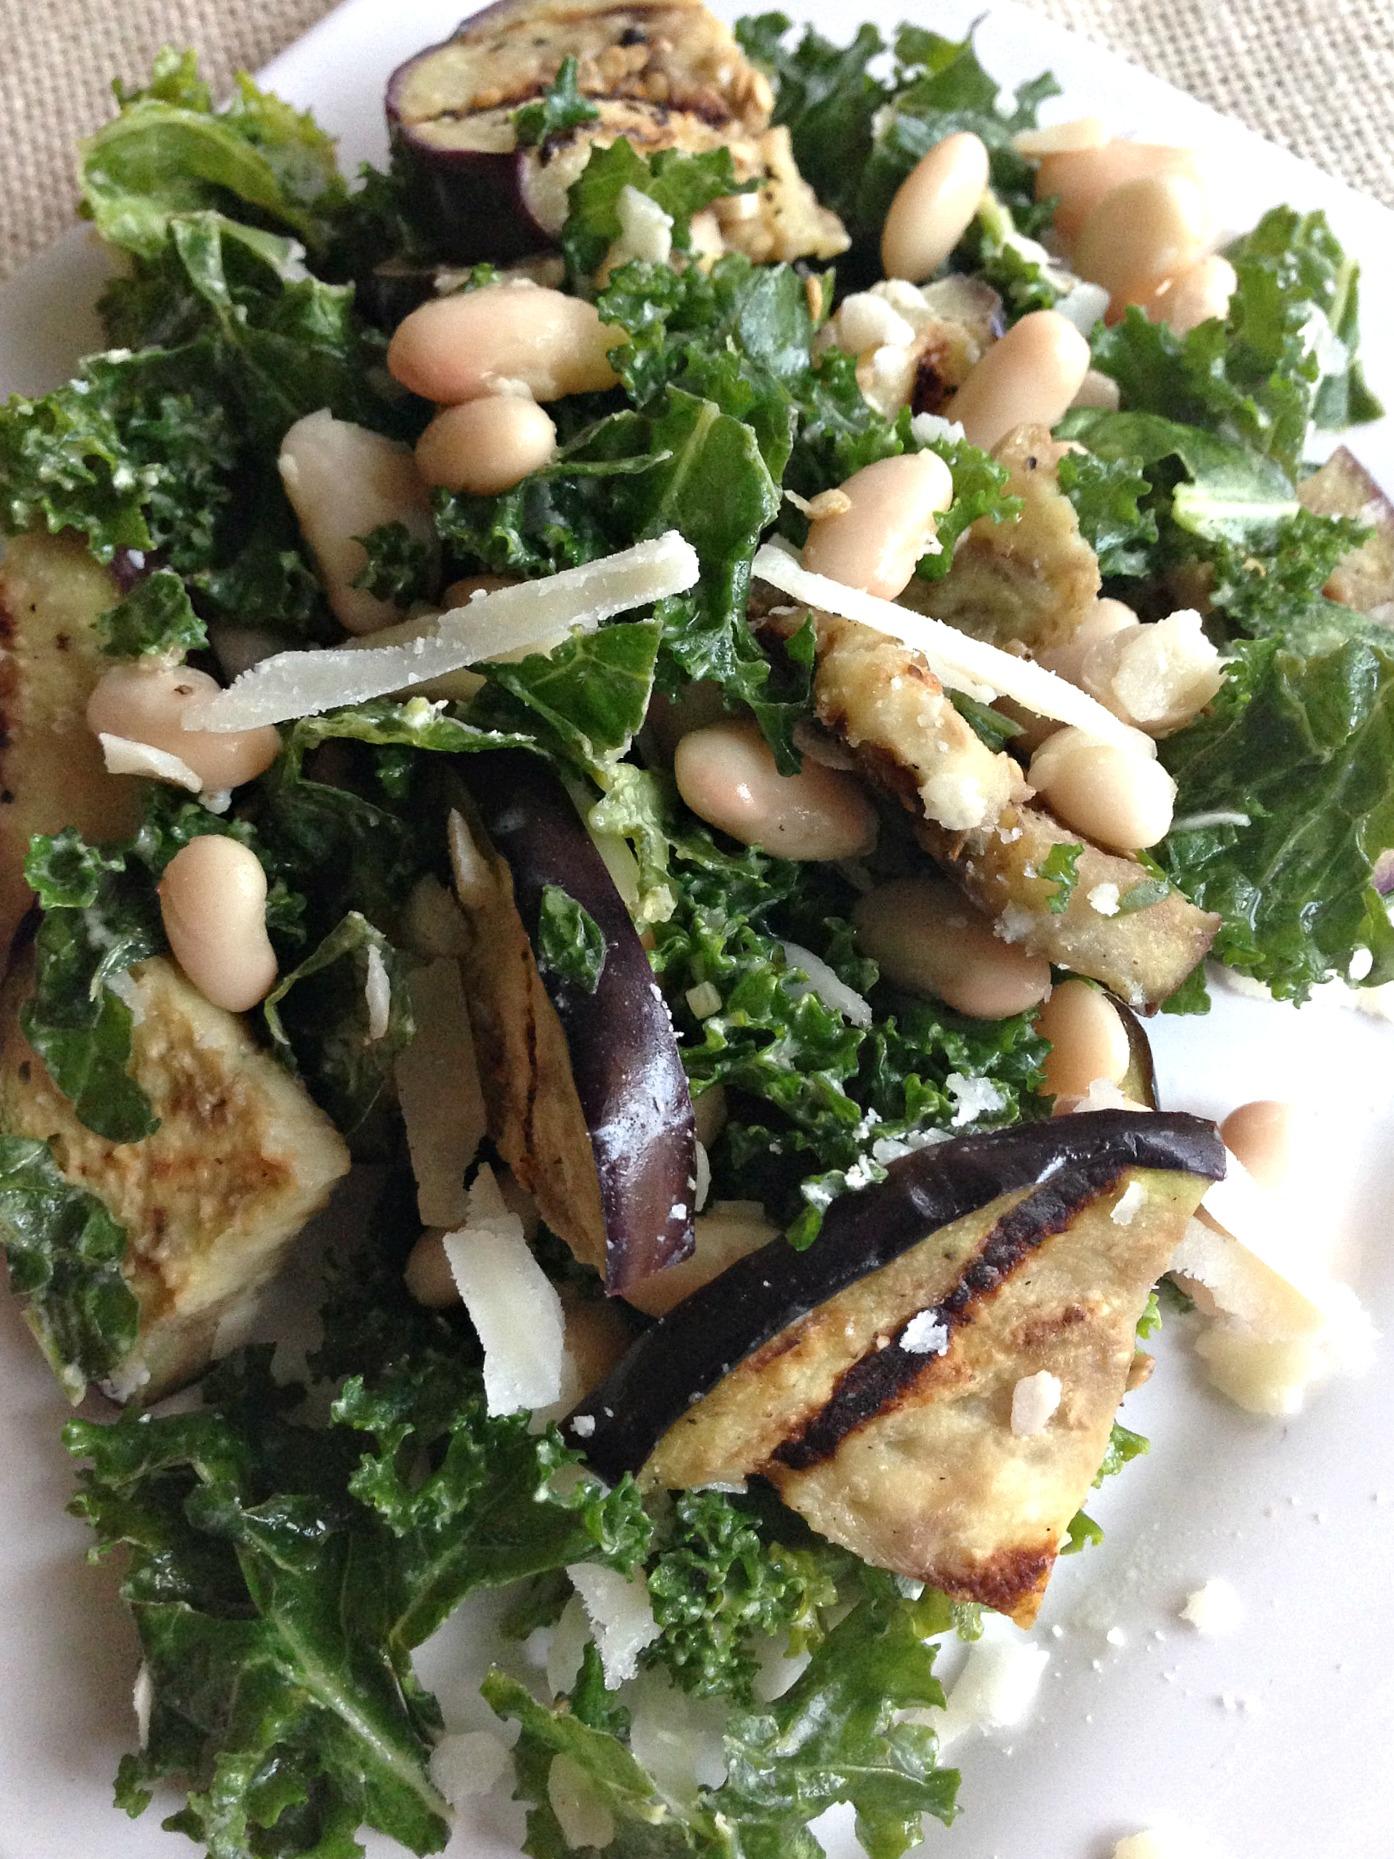 Eggplant and White Bean Kale Salad with Lemon Tahini Dressing